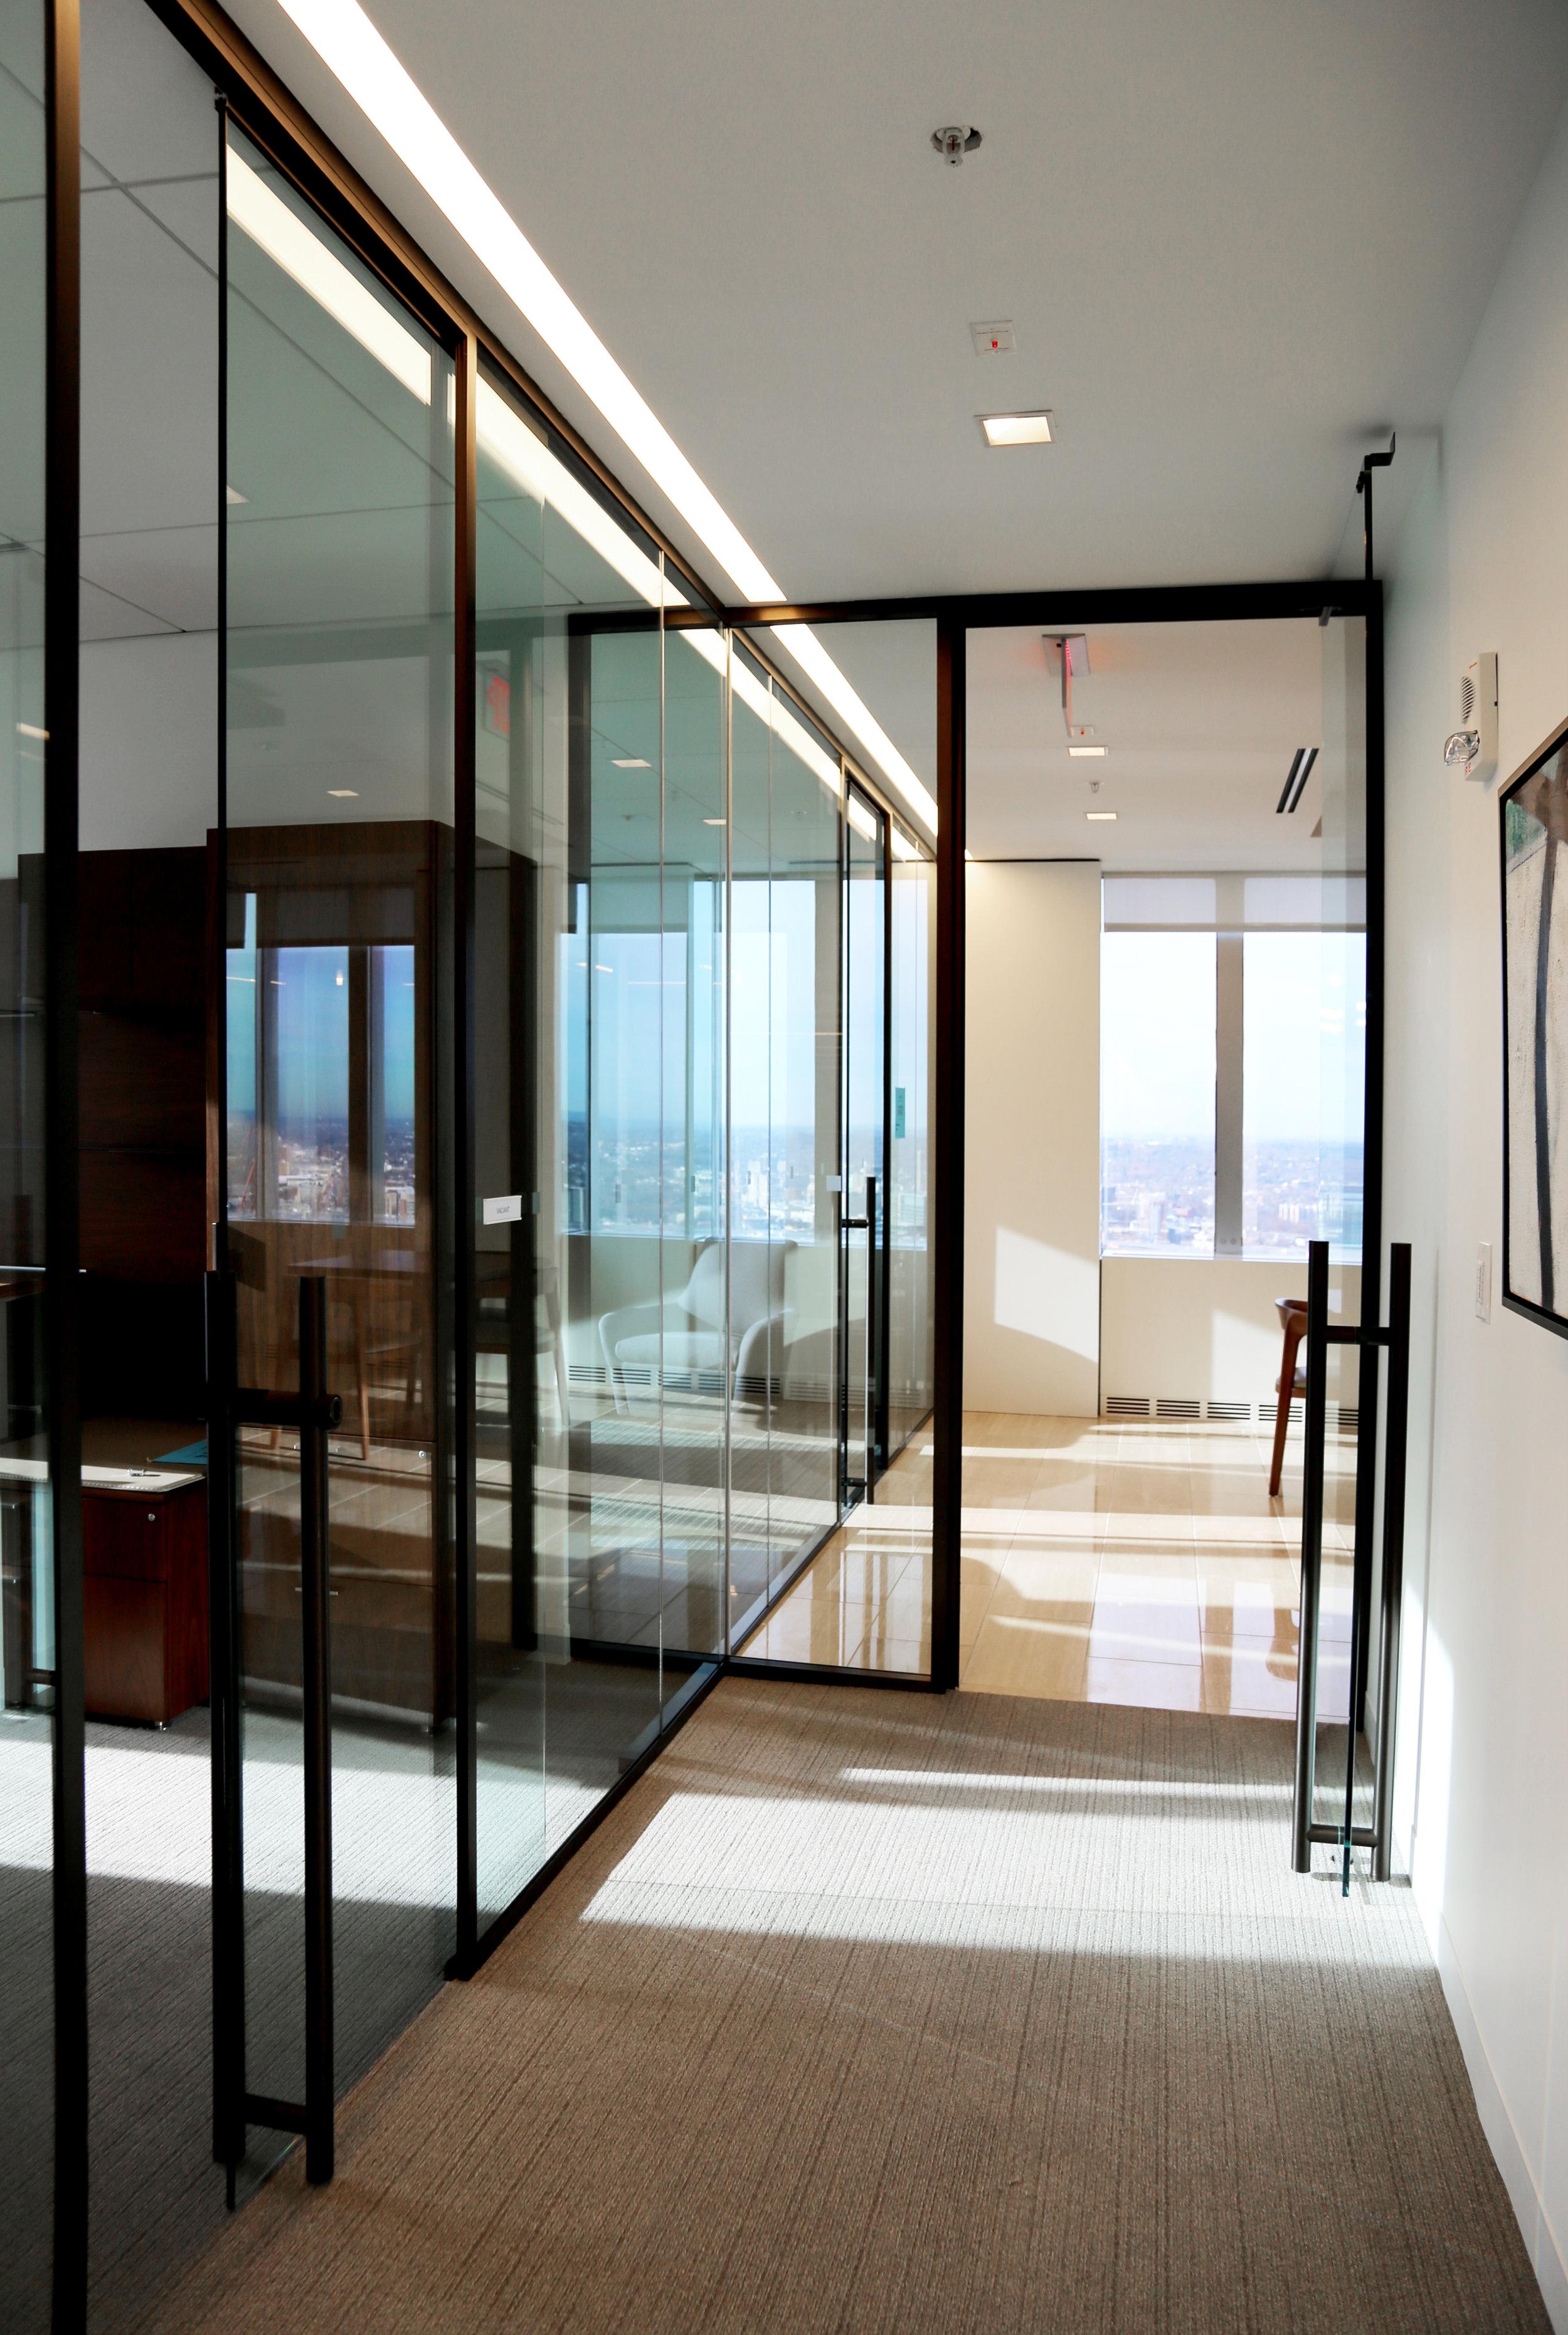 Modernus Glass Office Front Walls - Spaceworks AI.jpg